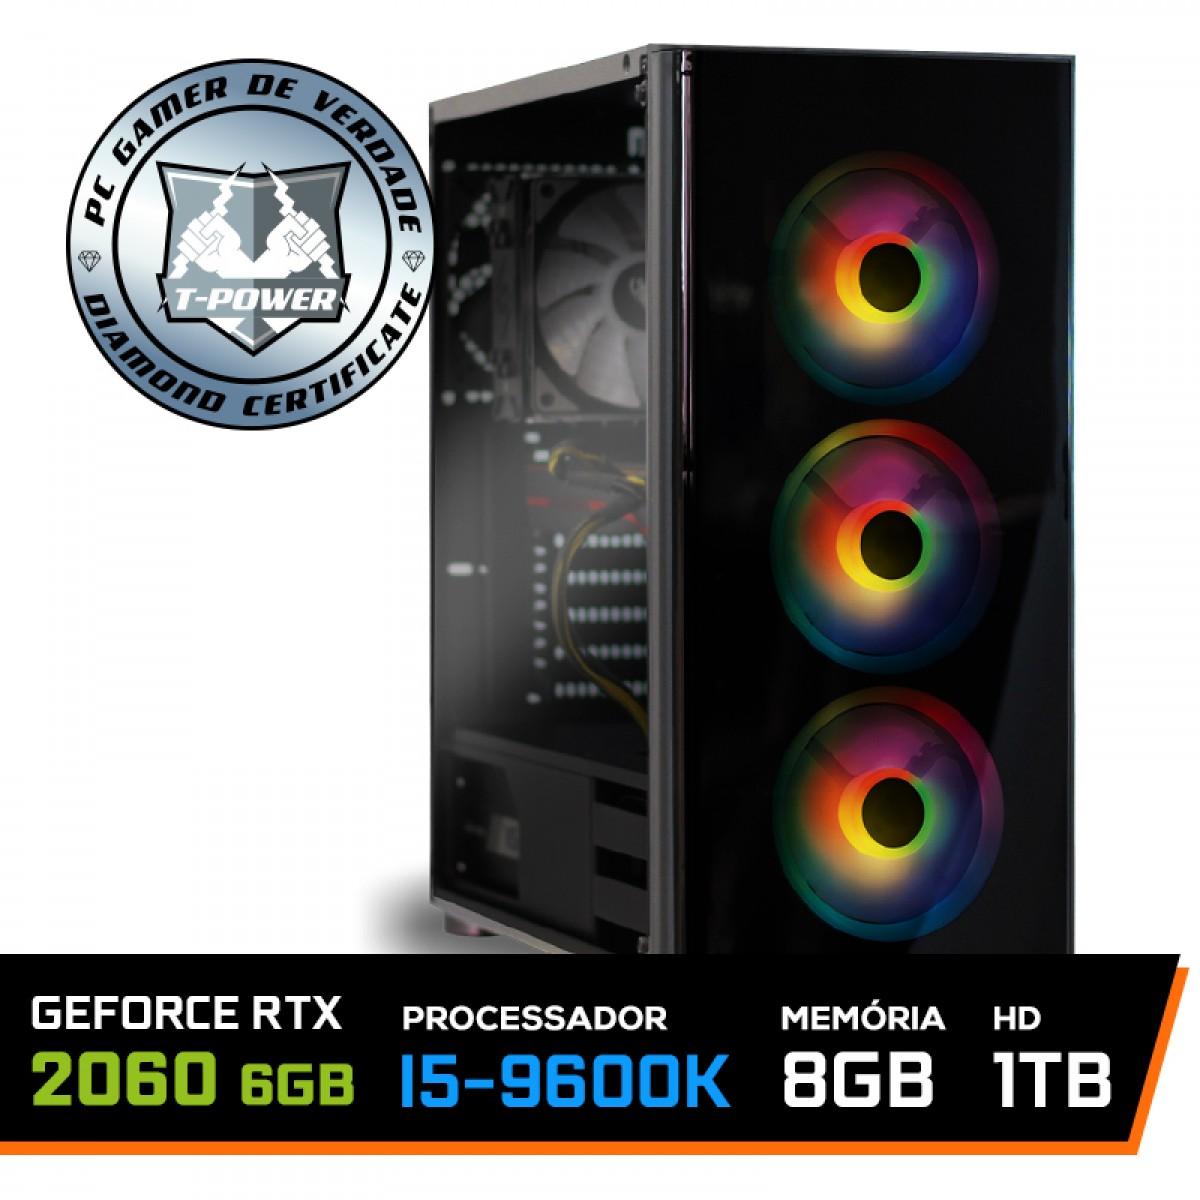 Pc Gamer T-power Glorious Edition Lvl-1 Intel I5 9600k / Geforce RTX 2060  6GB / DDR4 8GB / HD 1TB / 600W